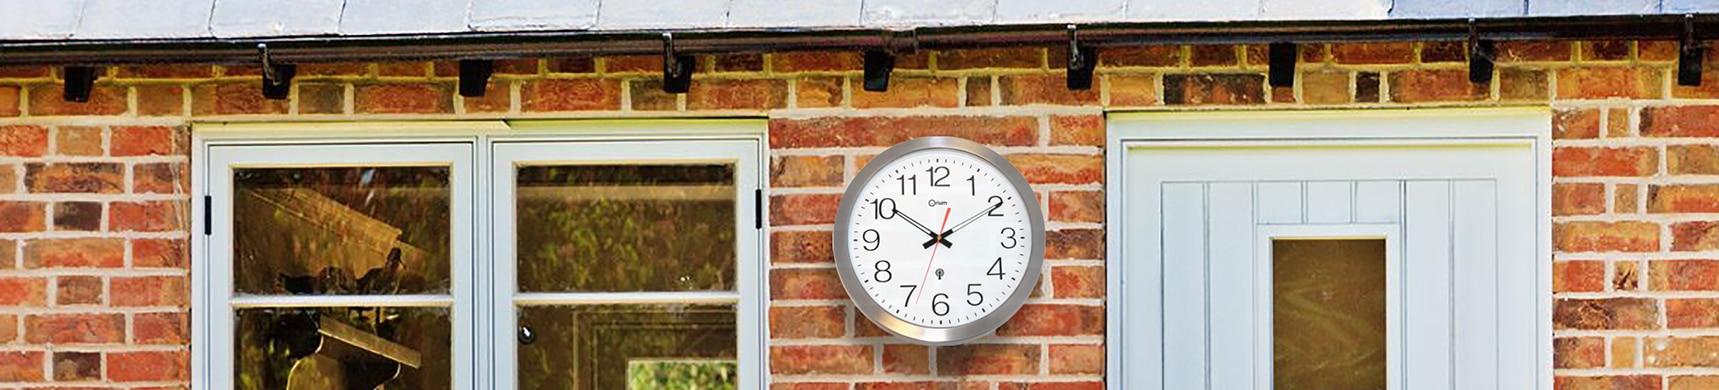 Horloge étanche inox Ø 35 cm